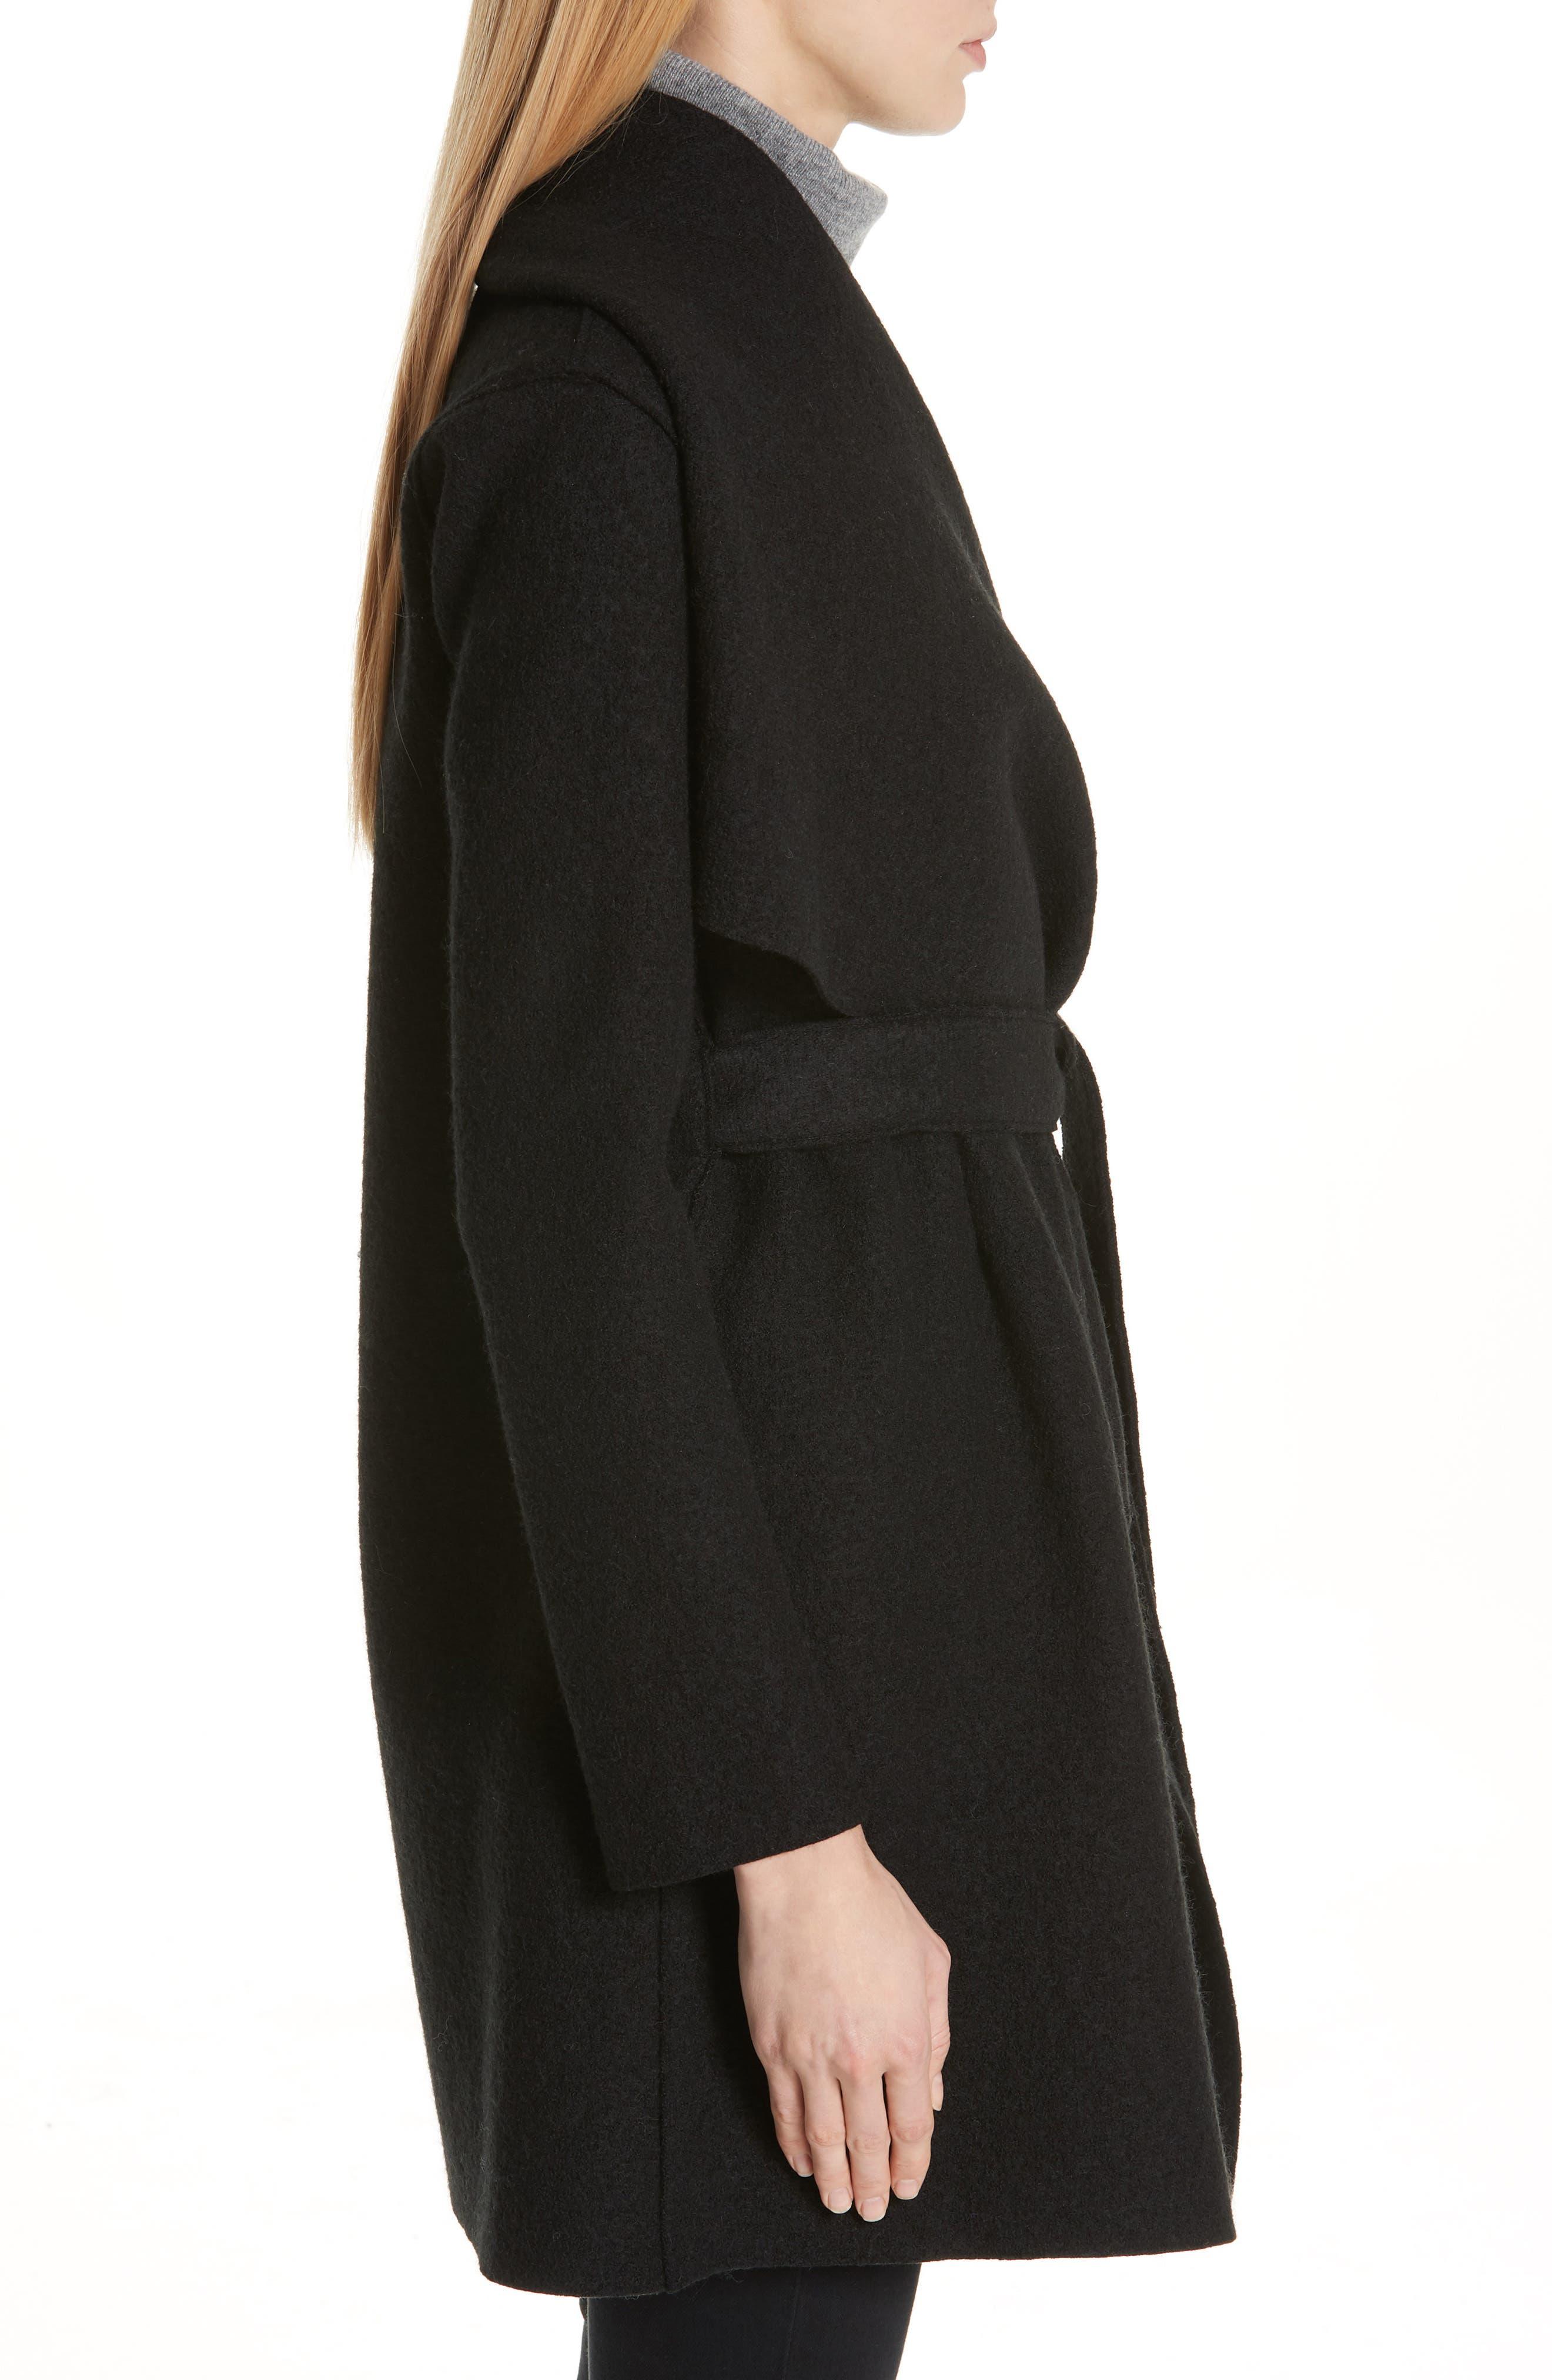 HARRIS WHARF LONDON, Belted Wool Coat, Alternate thumbnail 4, color, BLACK